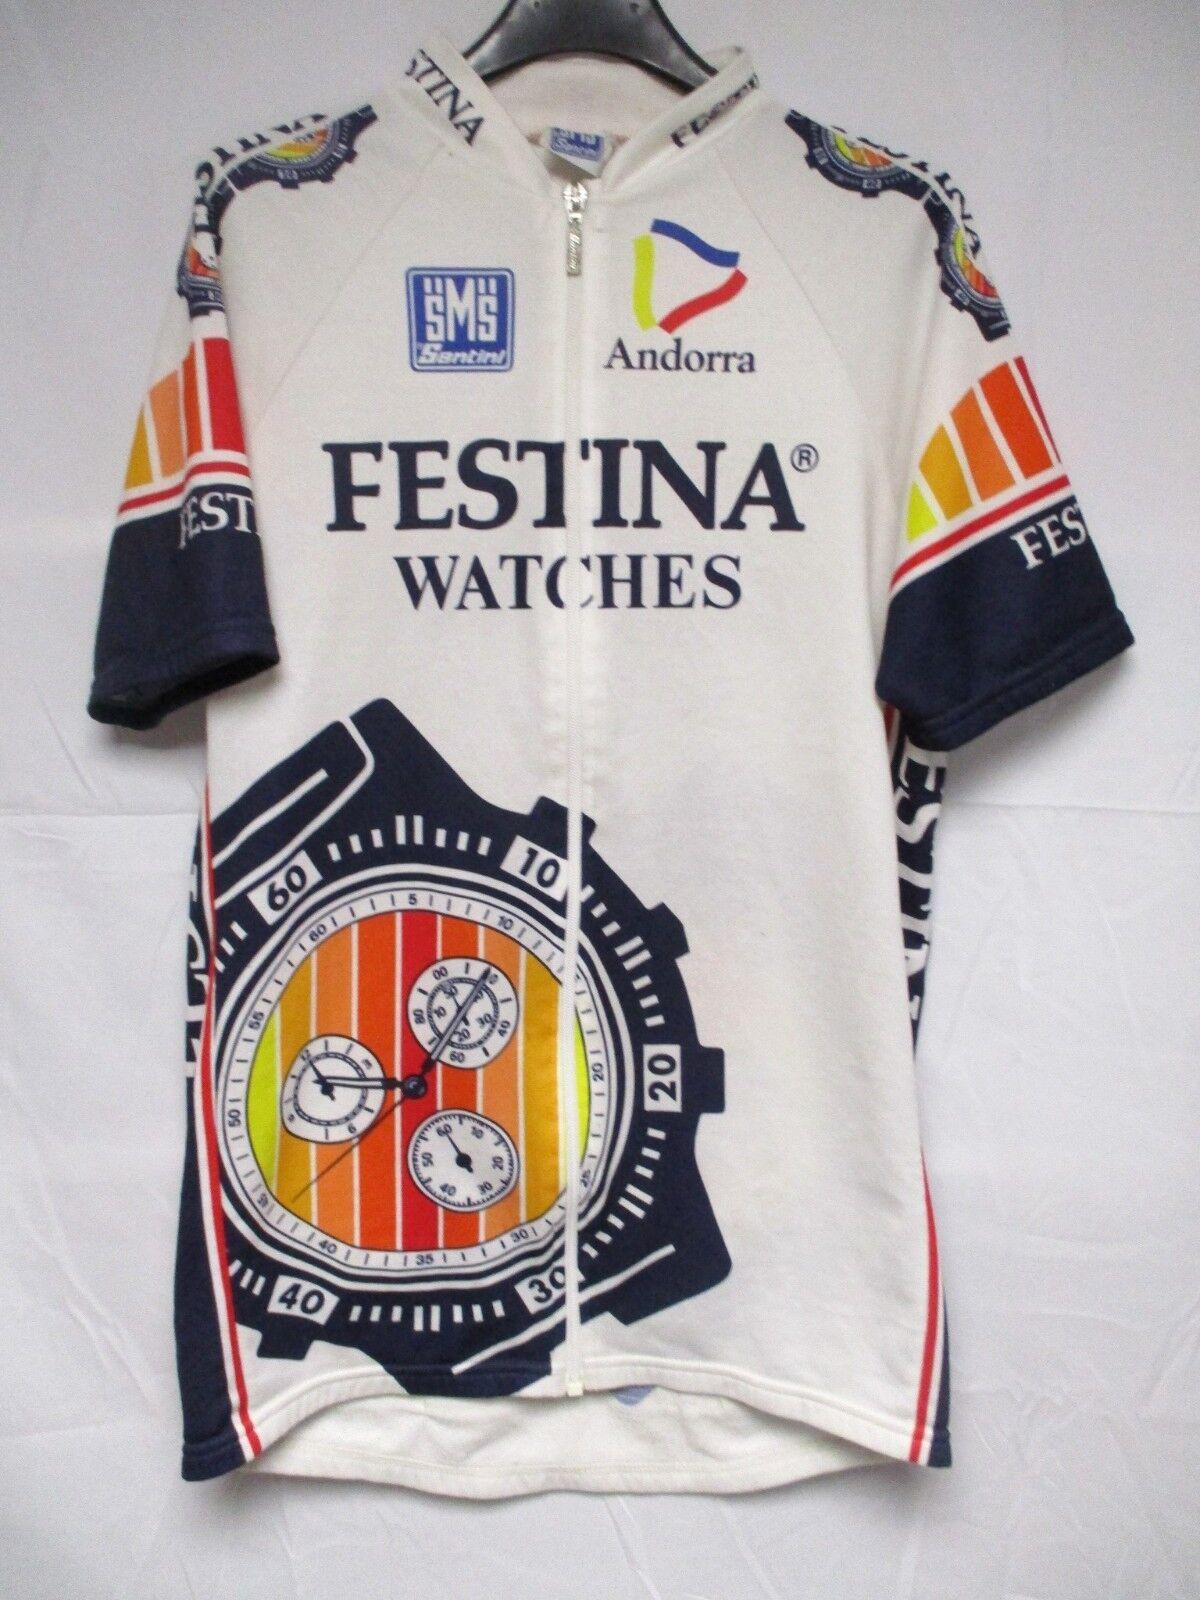 Maillot FESTINA Tour de France 1993 Virenque maglia shirt ANDORRA camiseta XXL